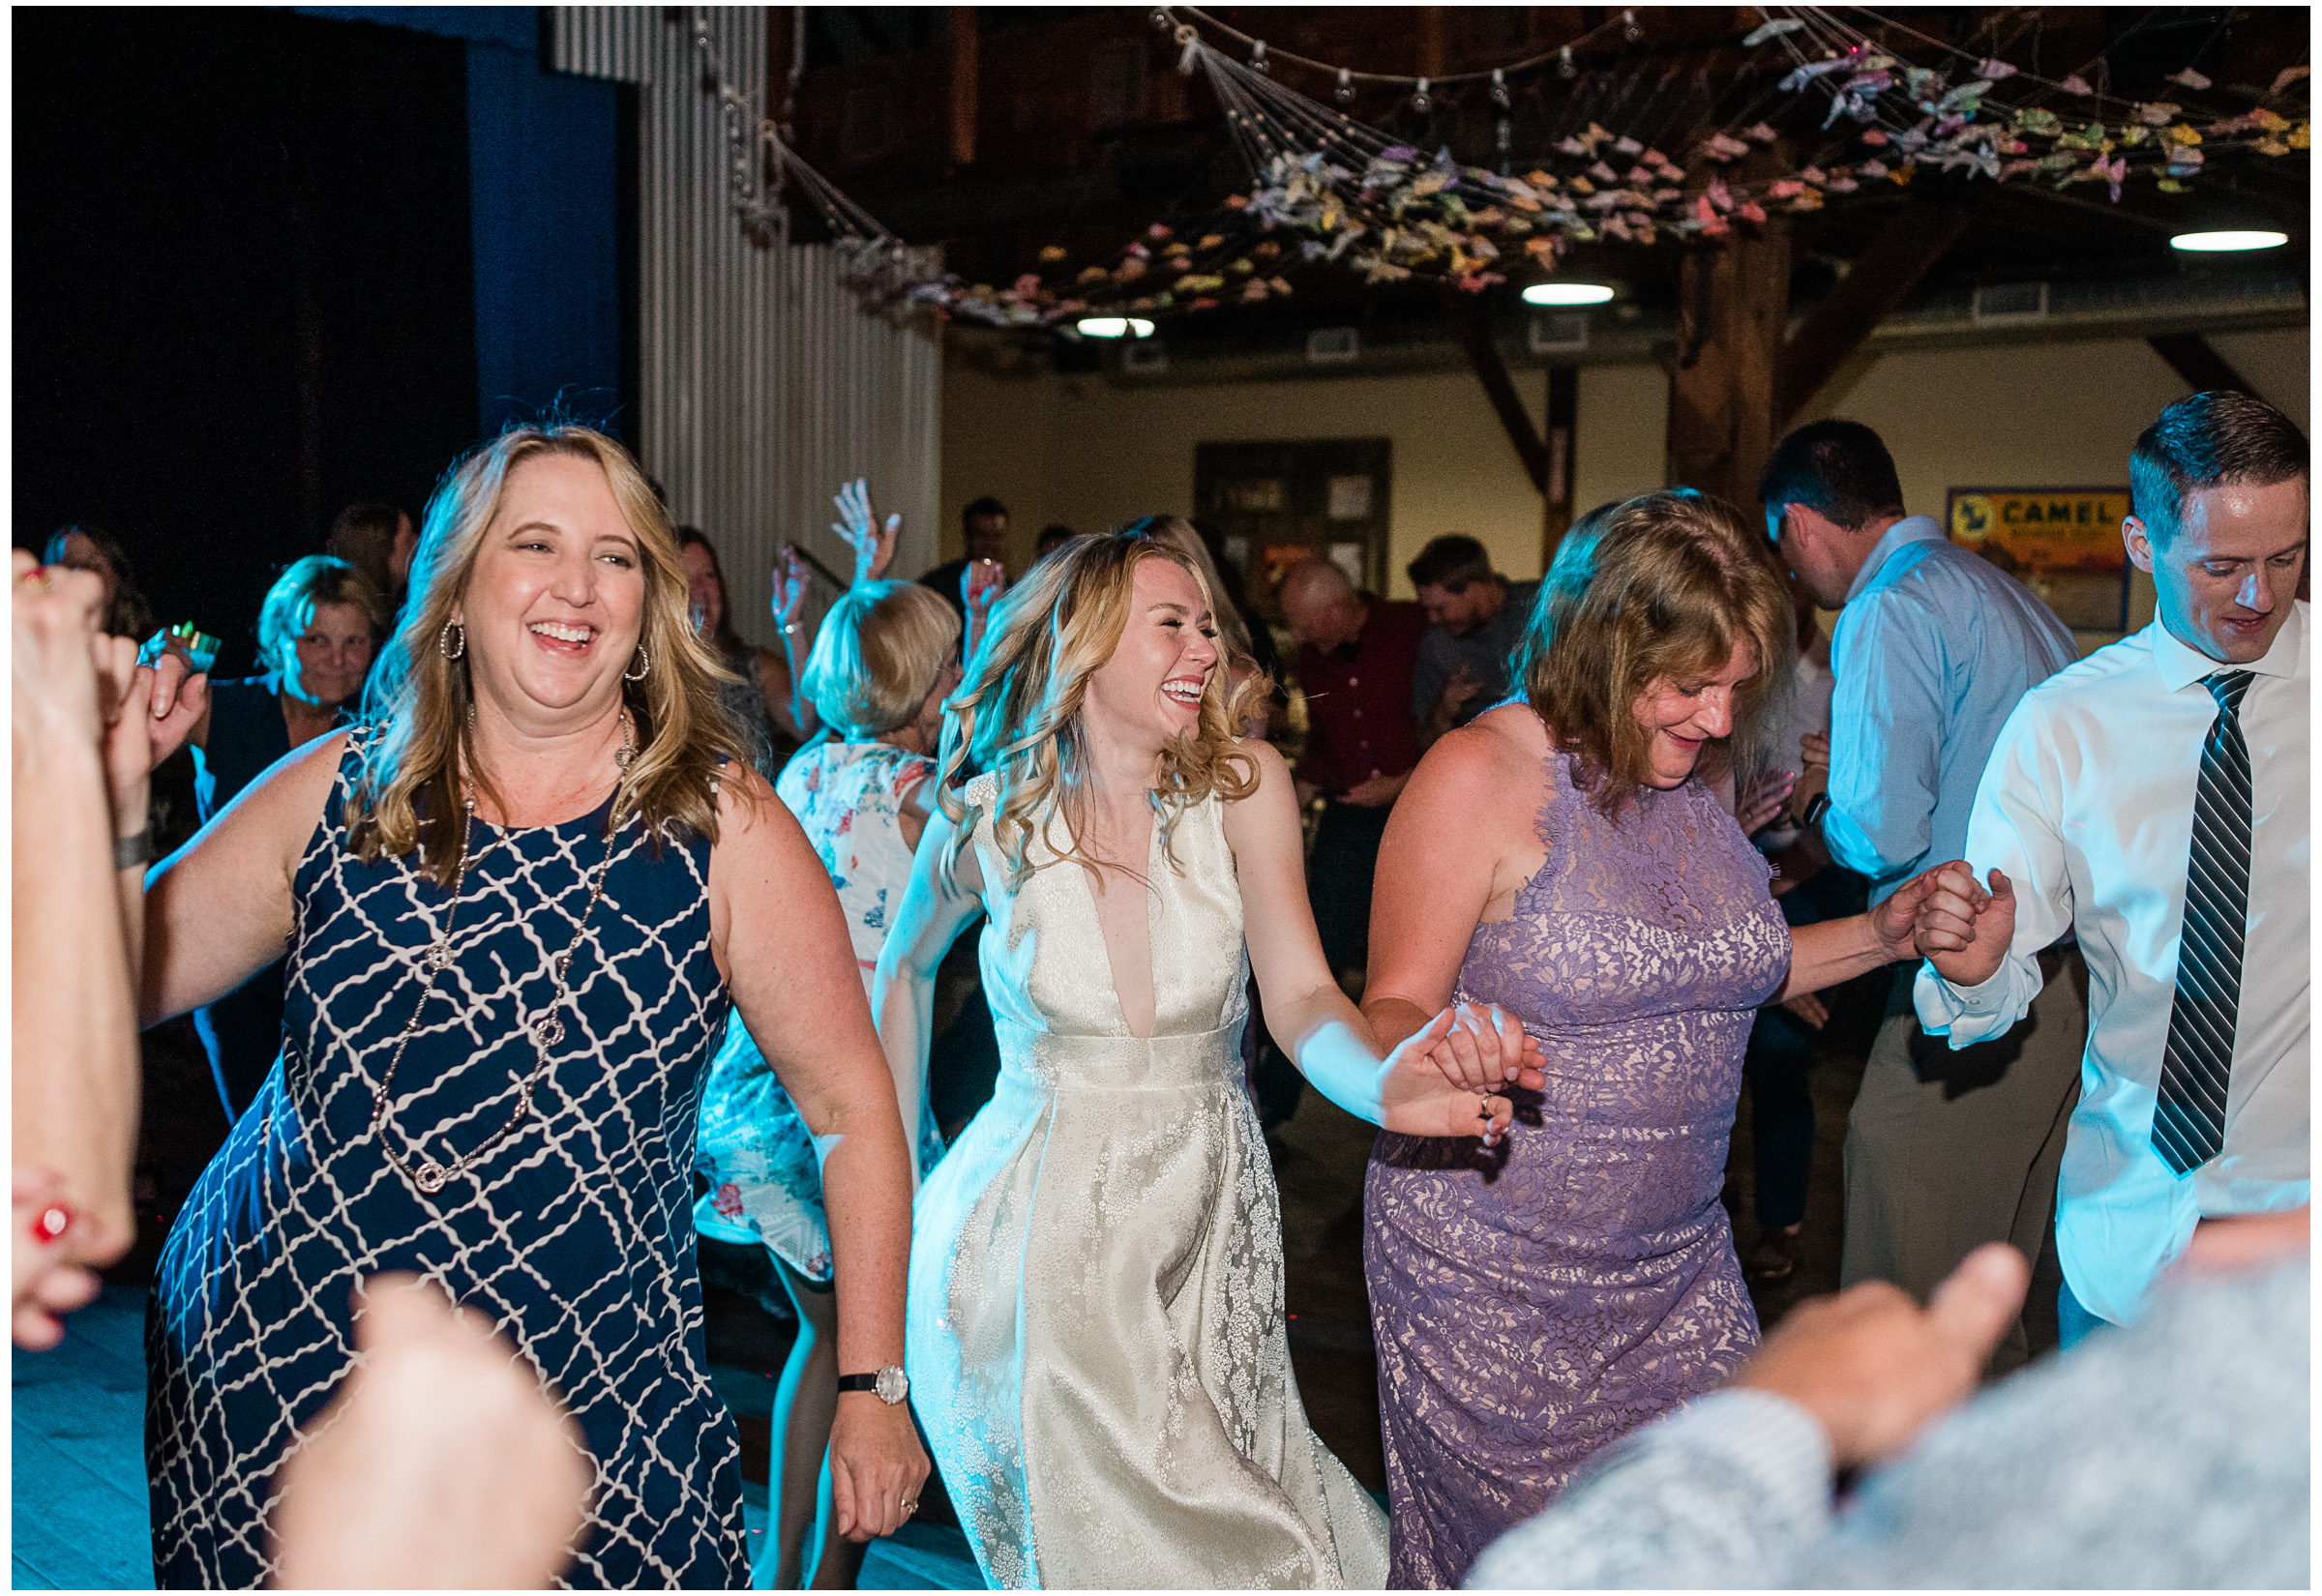 Loomis Wedding - Sacramento Photographer - Blue Goose - Justin Wilcox Photography - 23.jpg